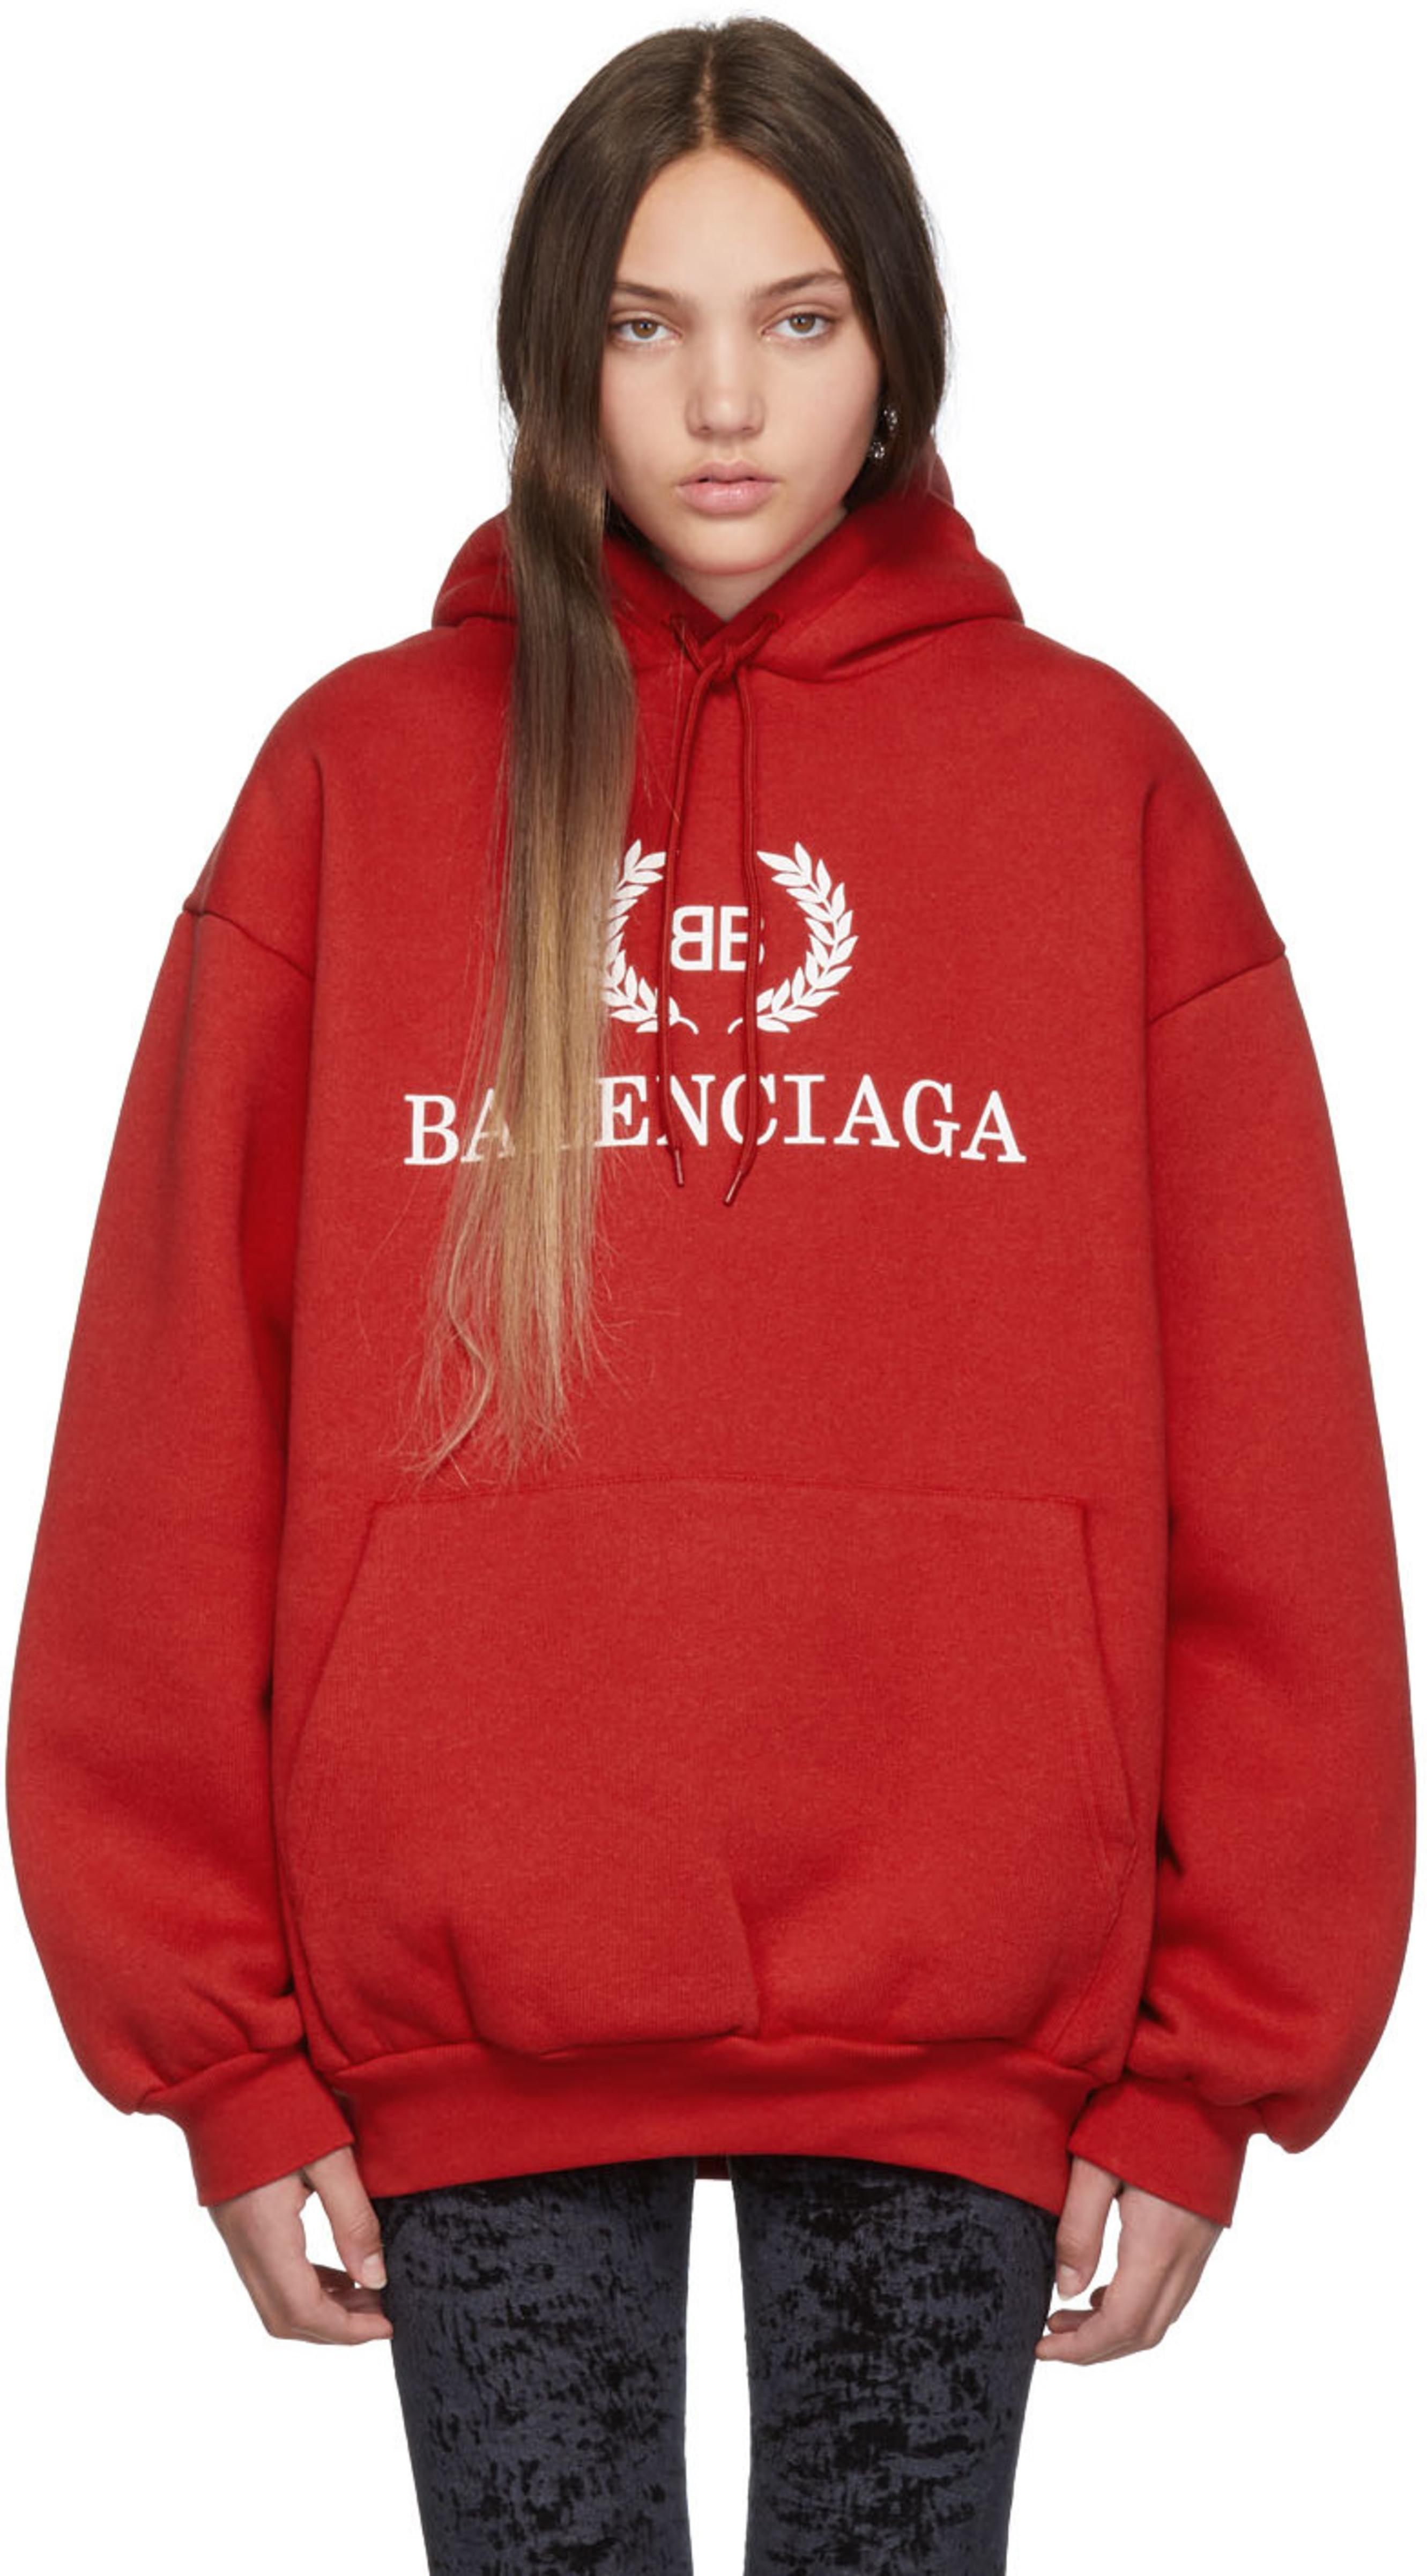 ca141d4f1a38 Balenciaga hoodies & zipups for Women   SSENSE Canada